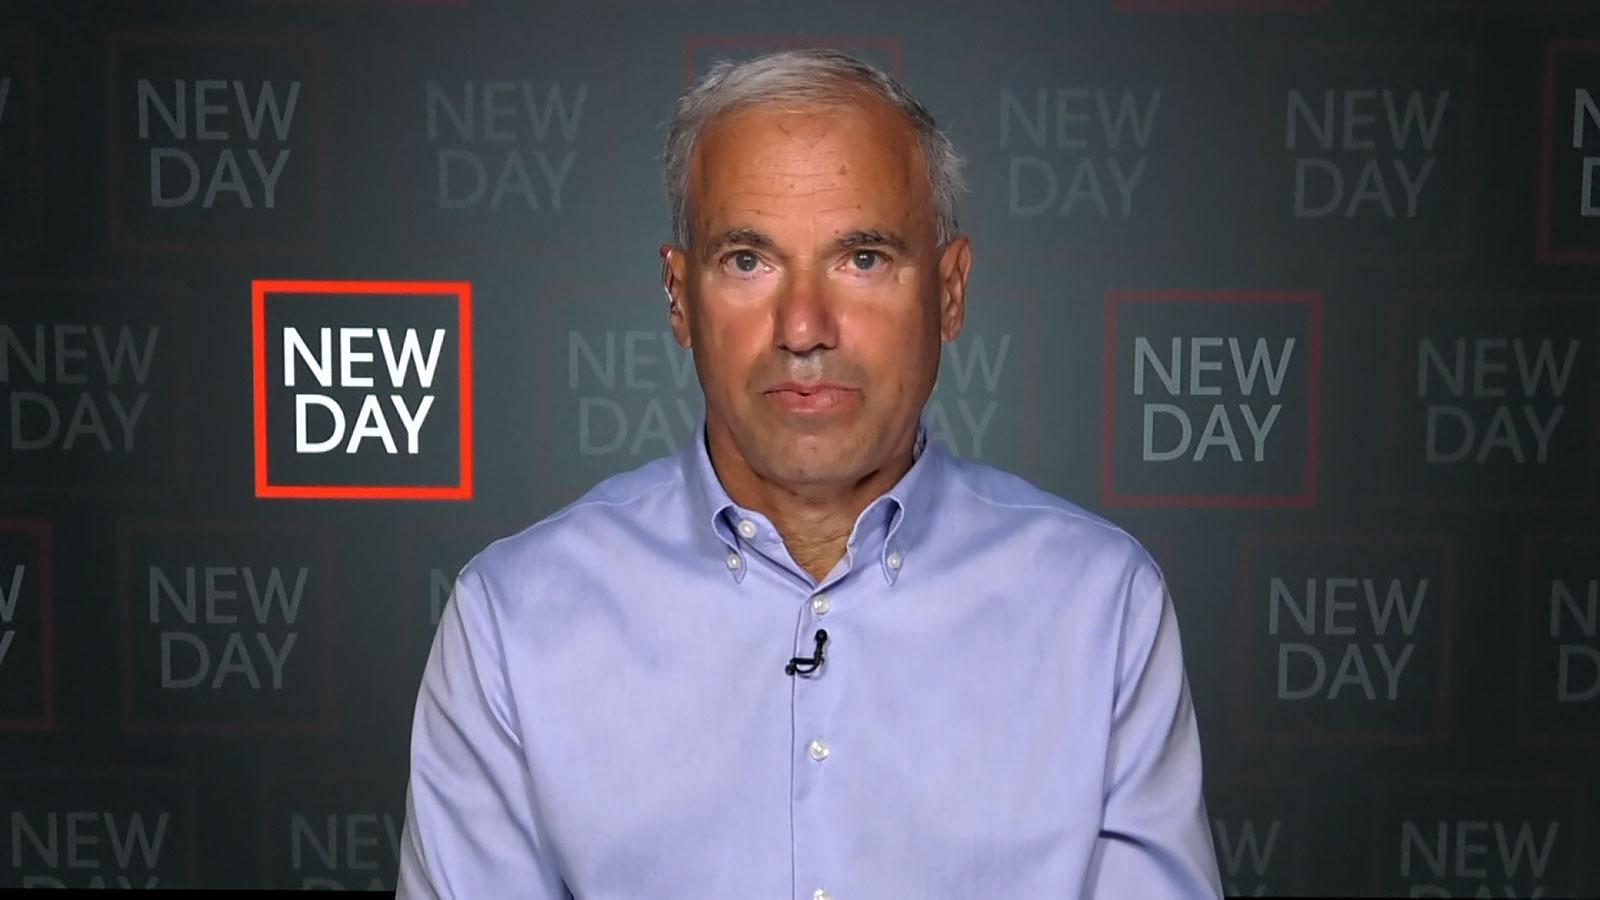 Dr. Jesse Goodman appears on CNN's New Day on September 17.